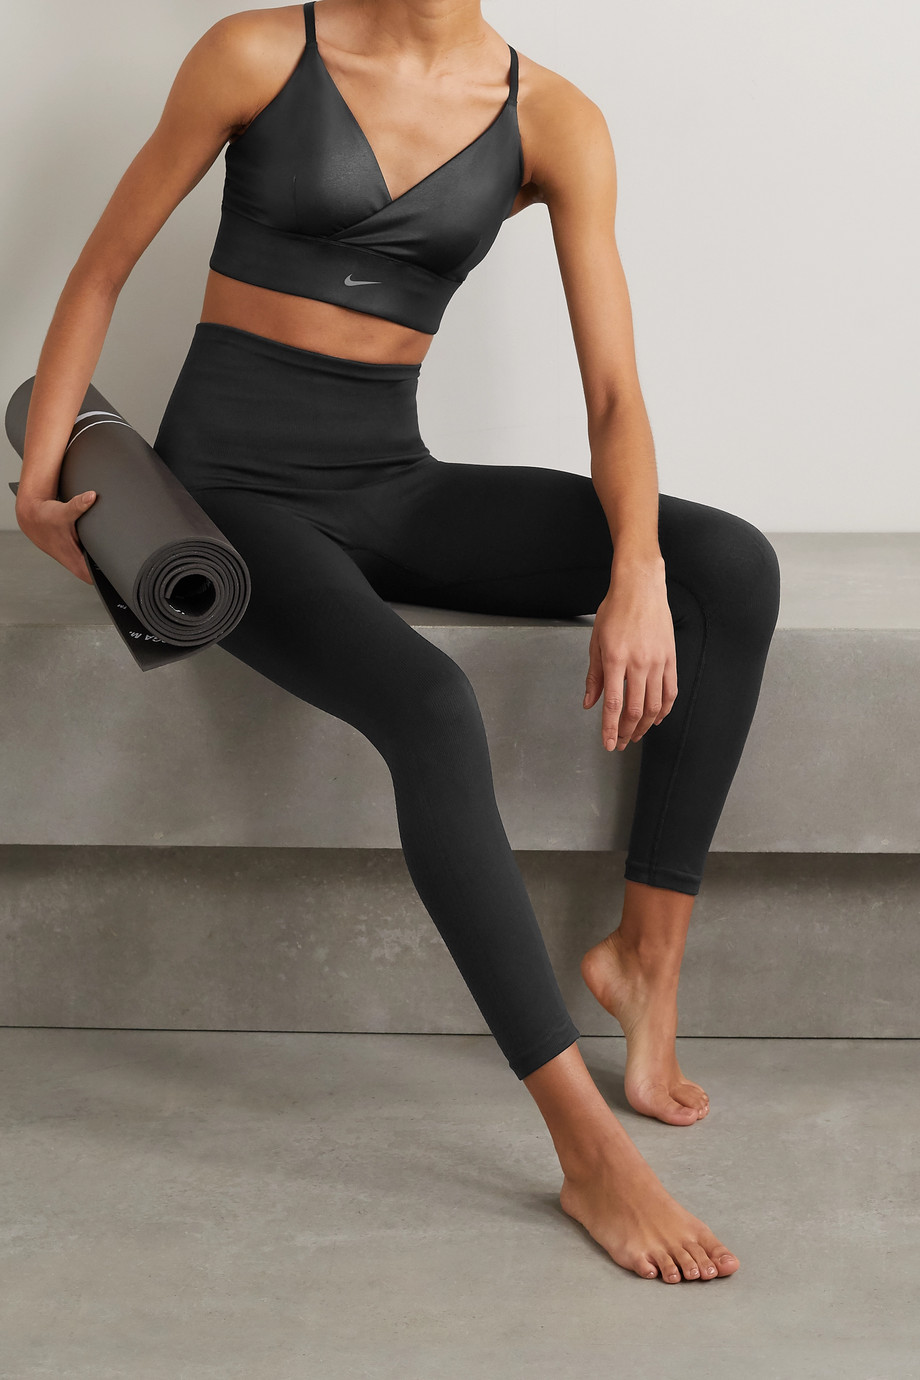 Nike Indy coated Dri-FIT sports bra